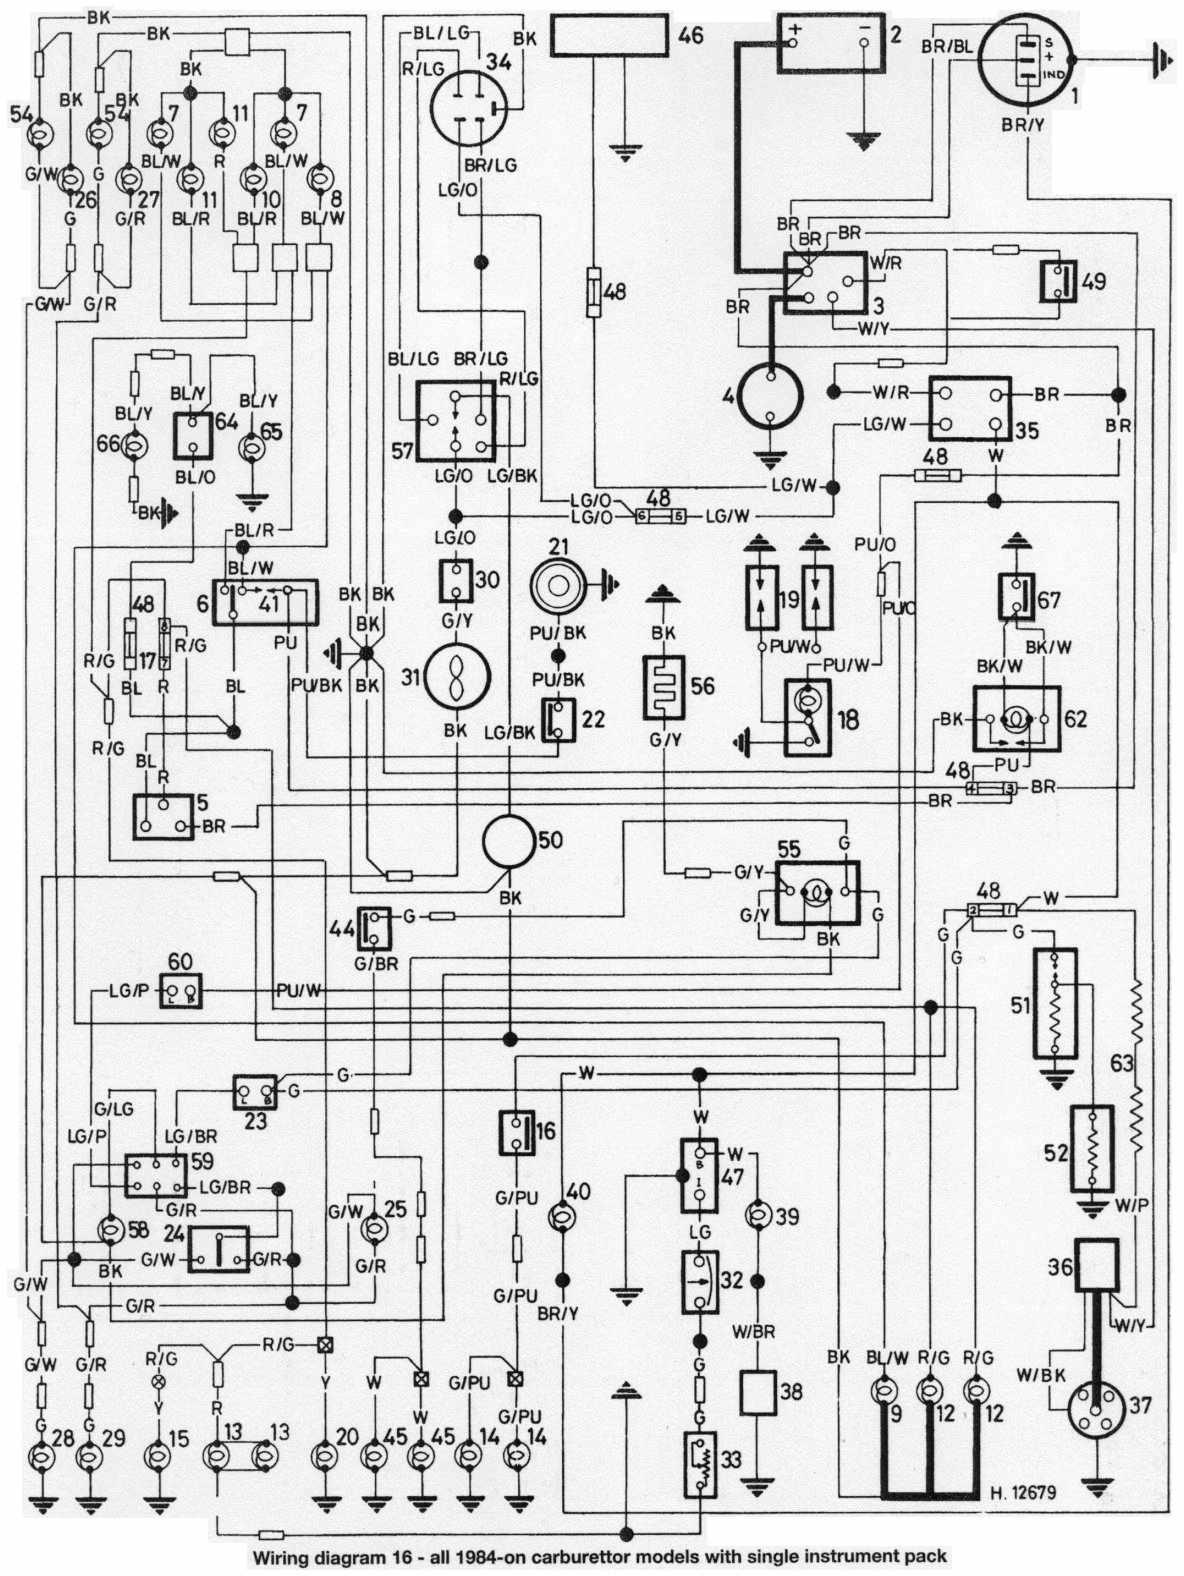 mini wiring diagrams wiring diagram portal cooper gfci wiring diagram 2002 mini wiring diagram wiring [ 1184 x 1576 Pixel ]